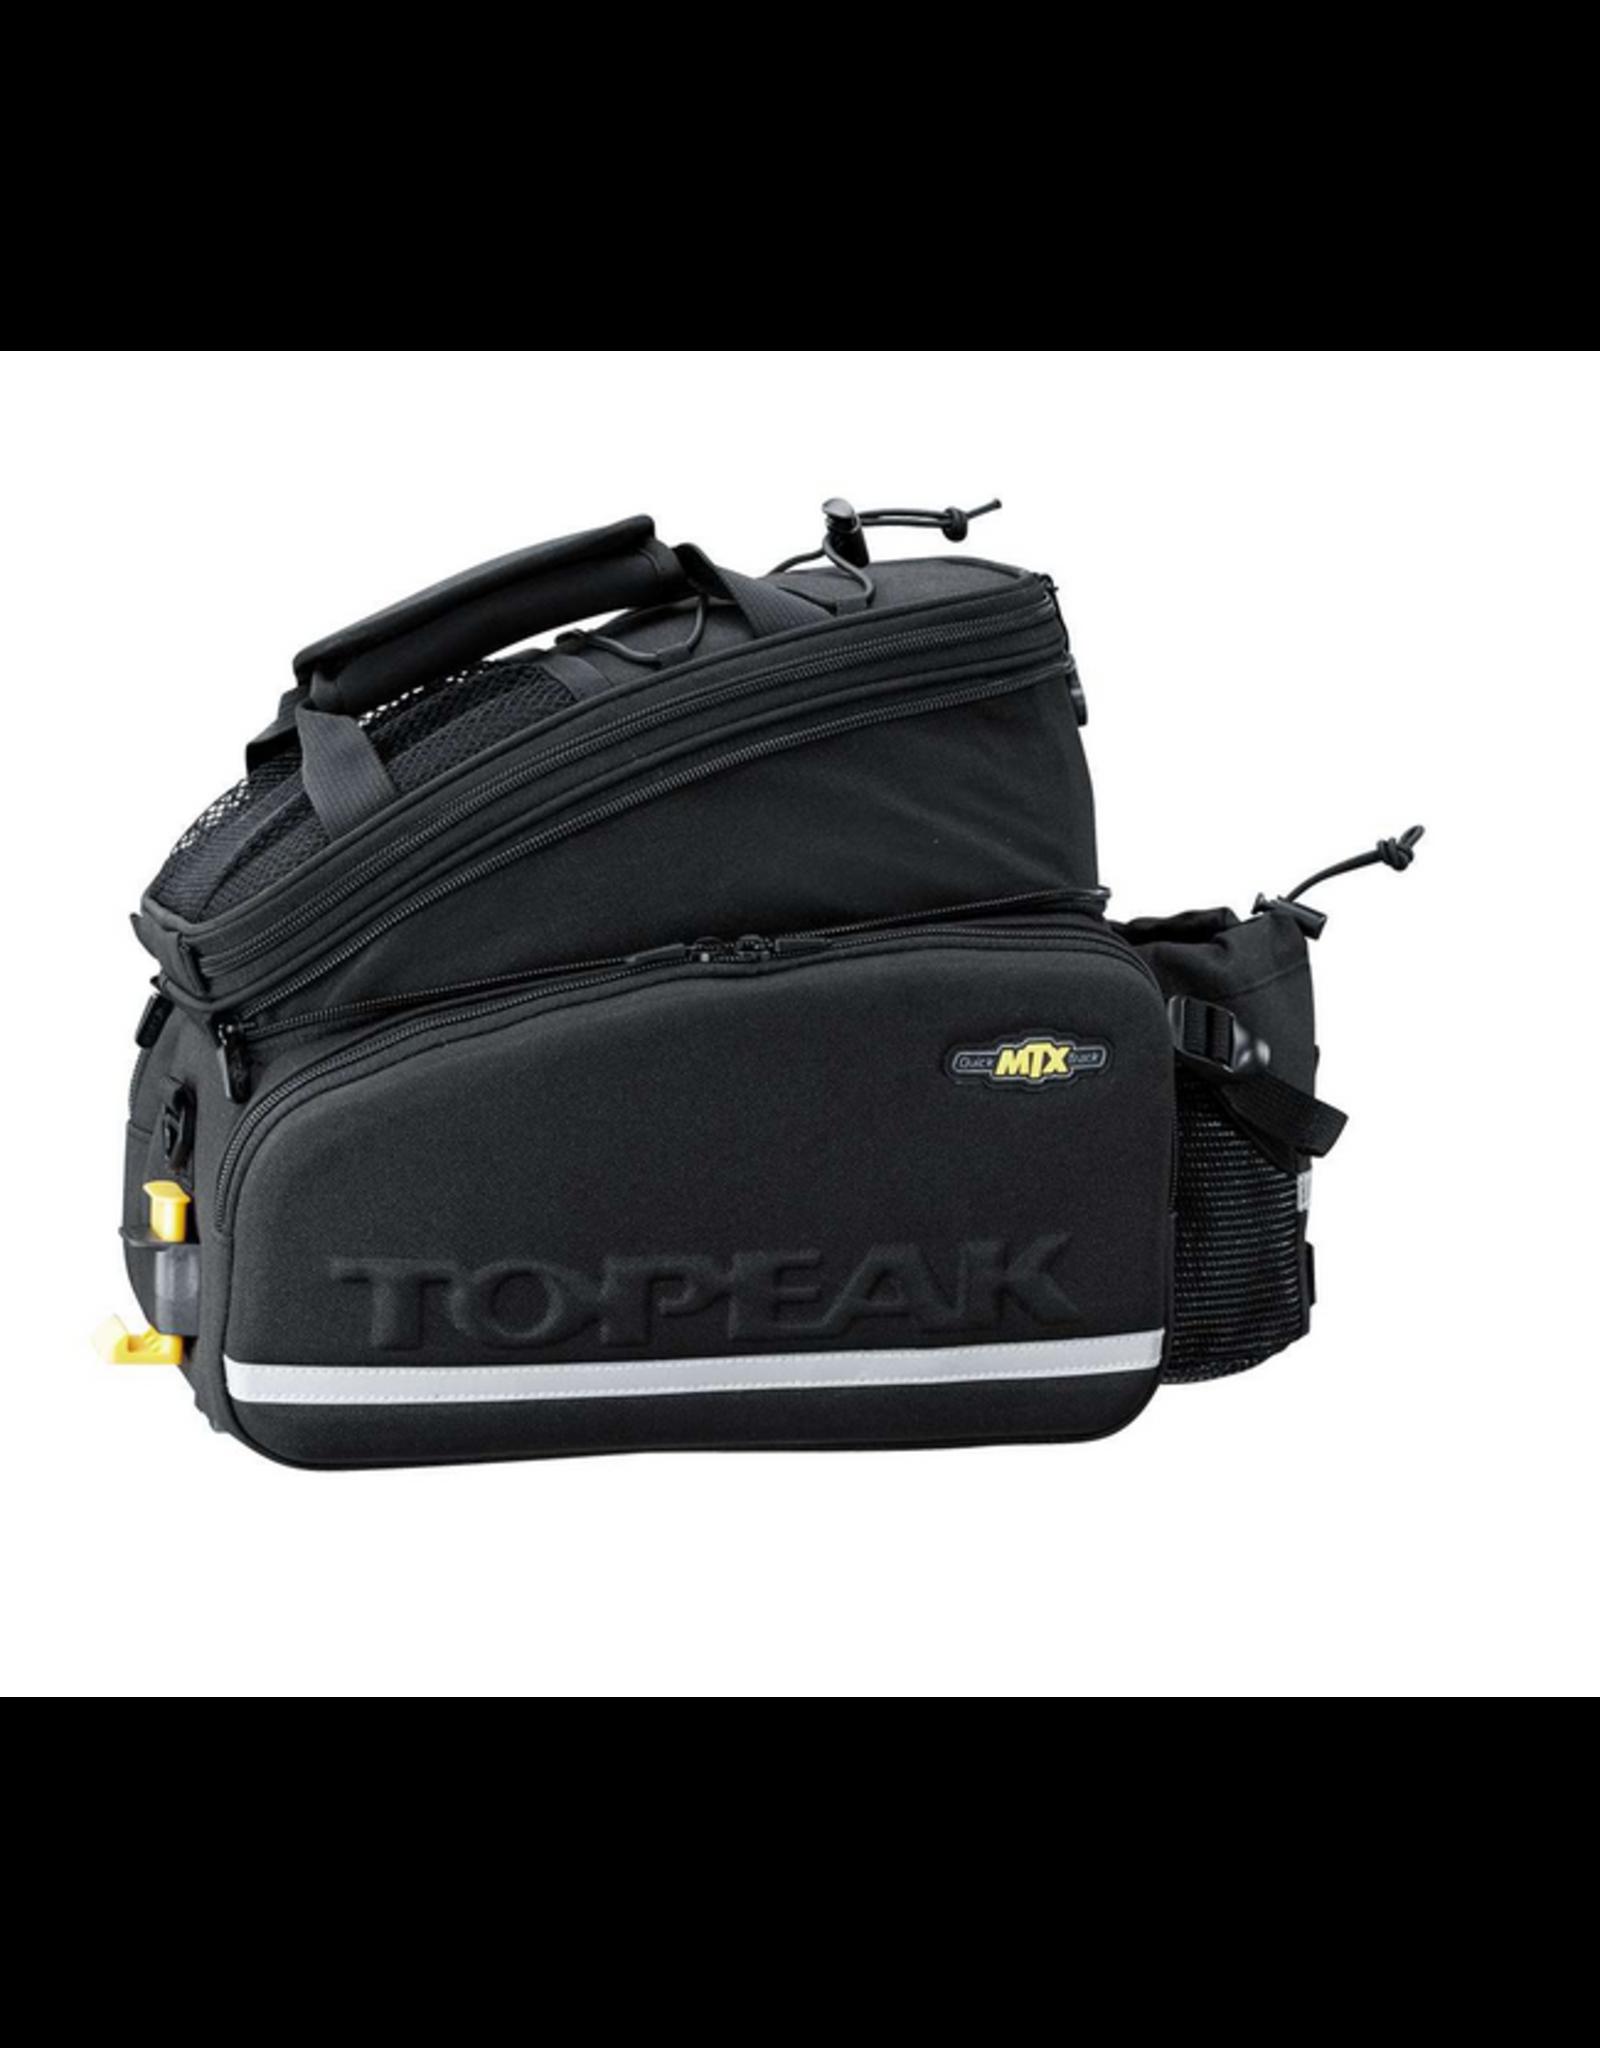 Topeak Topeak Topeak MTX Trunkbag